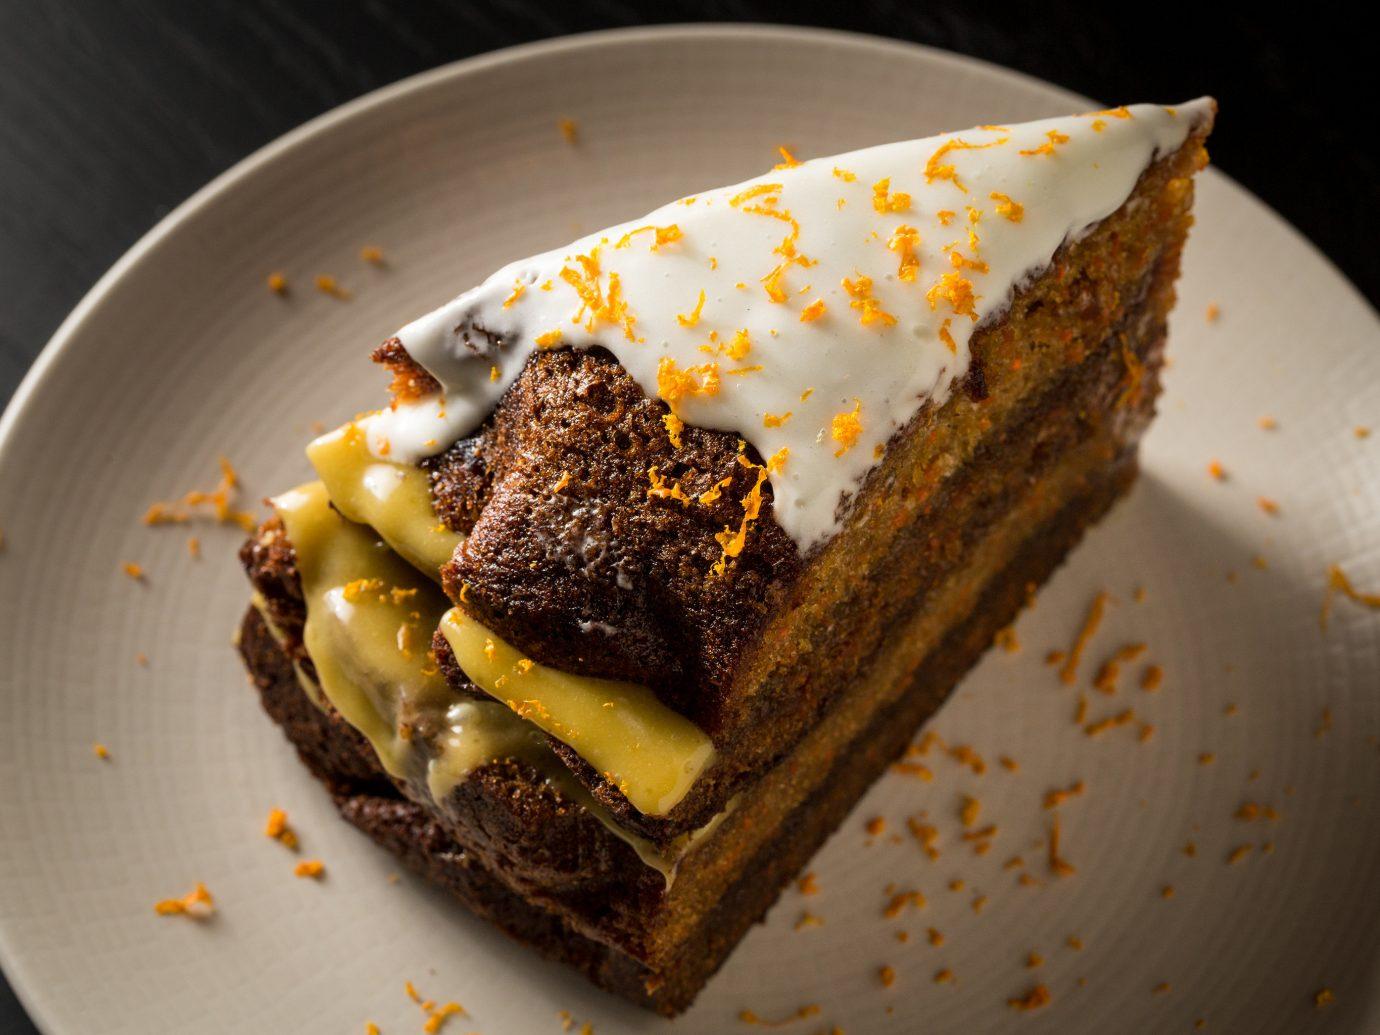 Food + Drink plate cake piece slice dessert food cream chocolate fork frozen dessert ice carrot cake